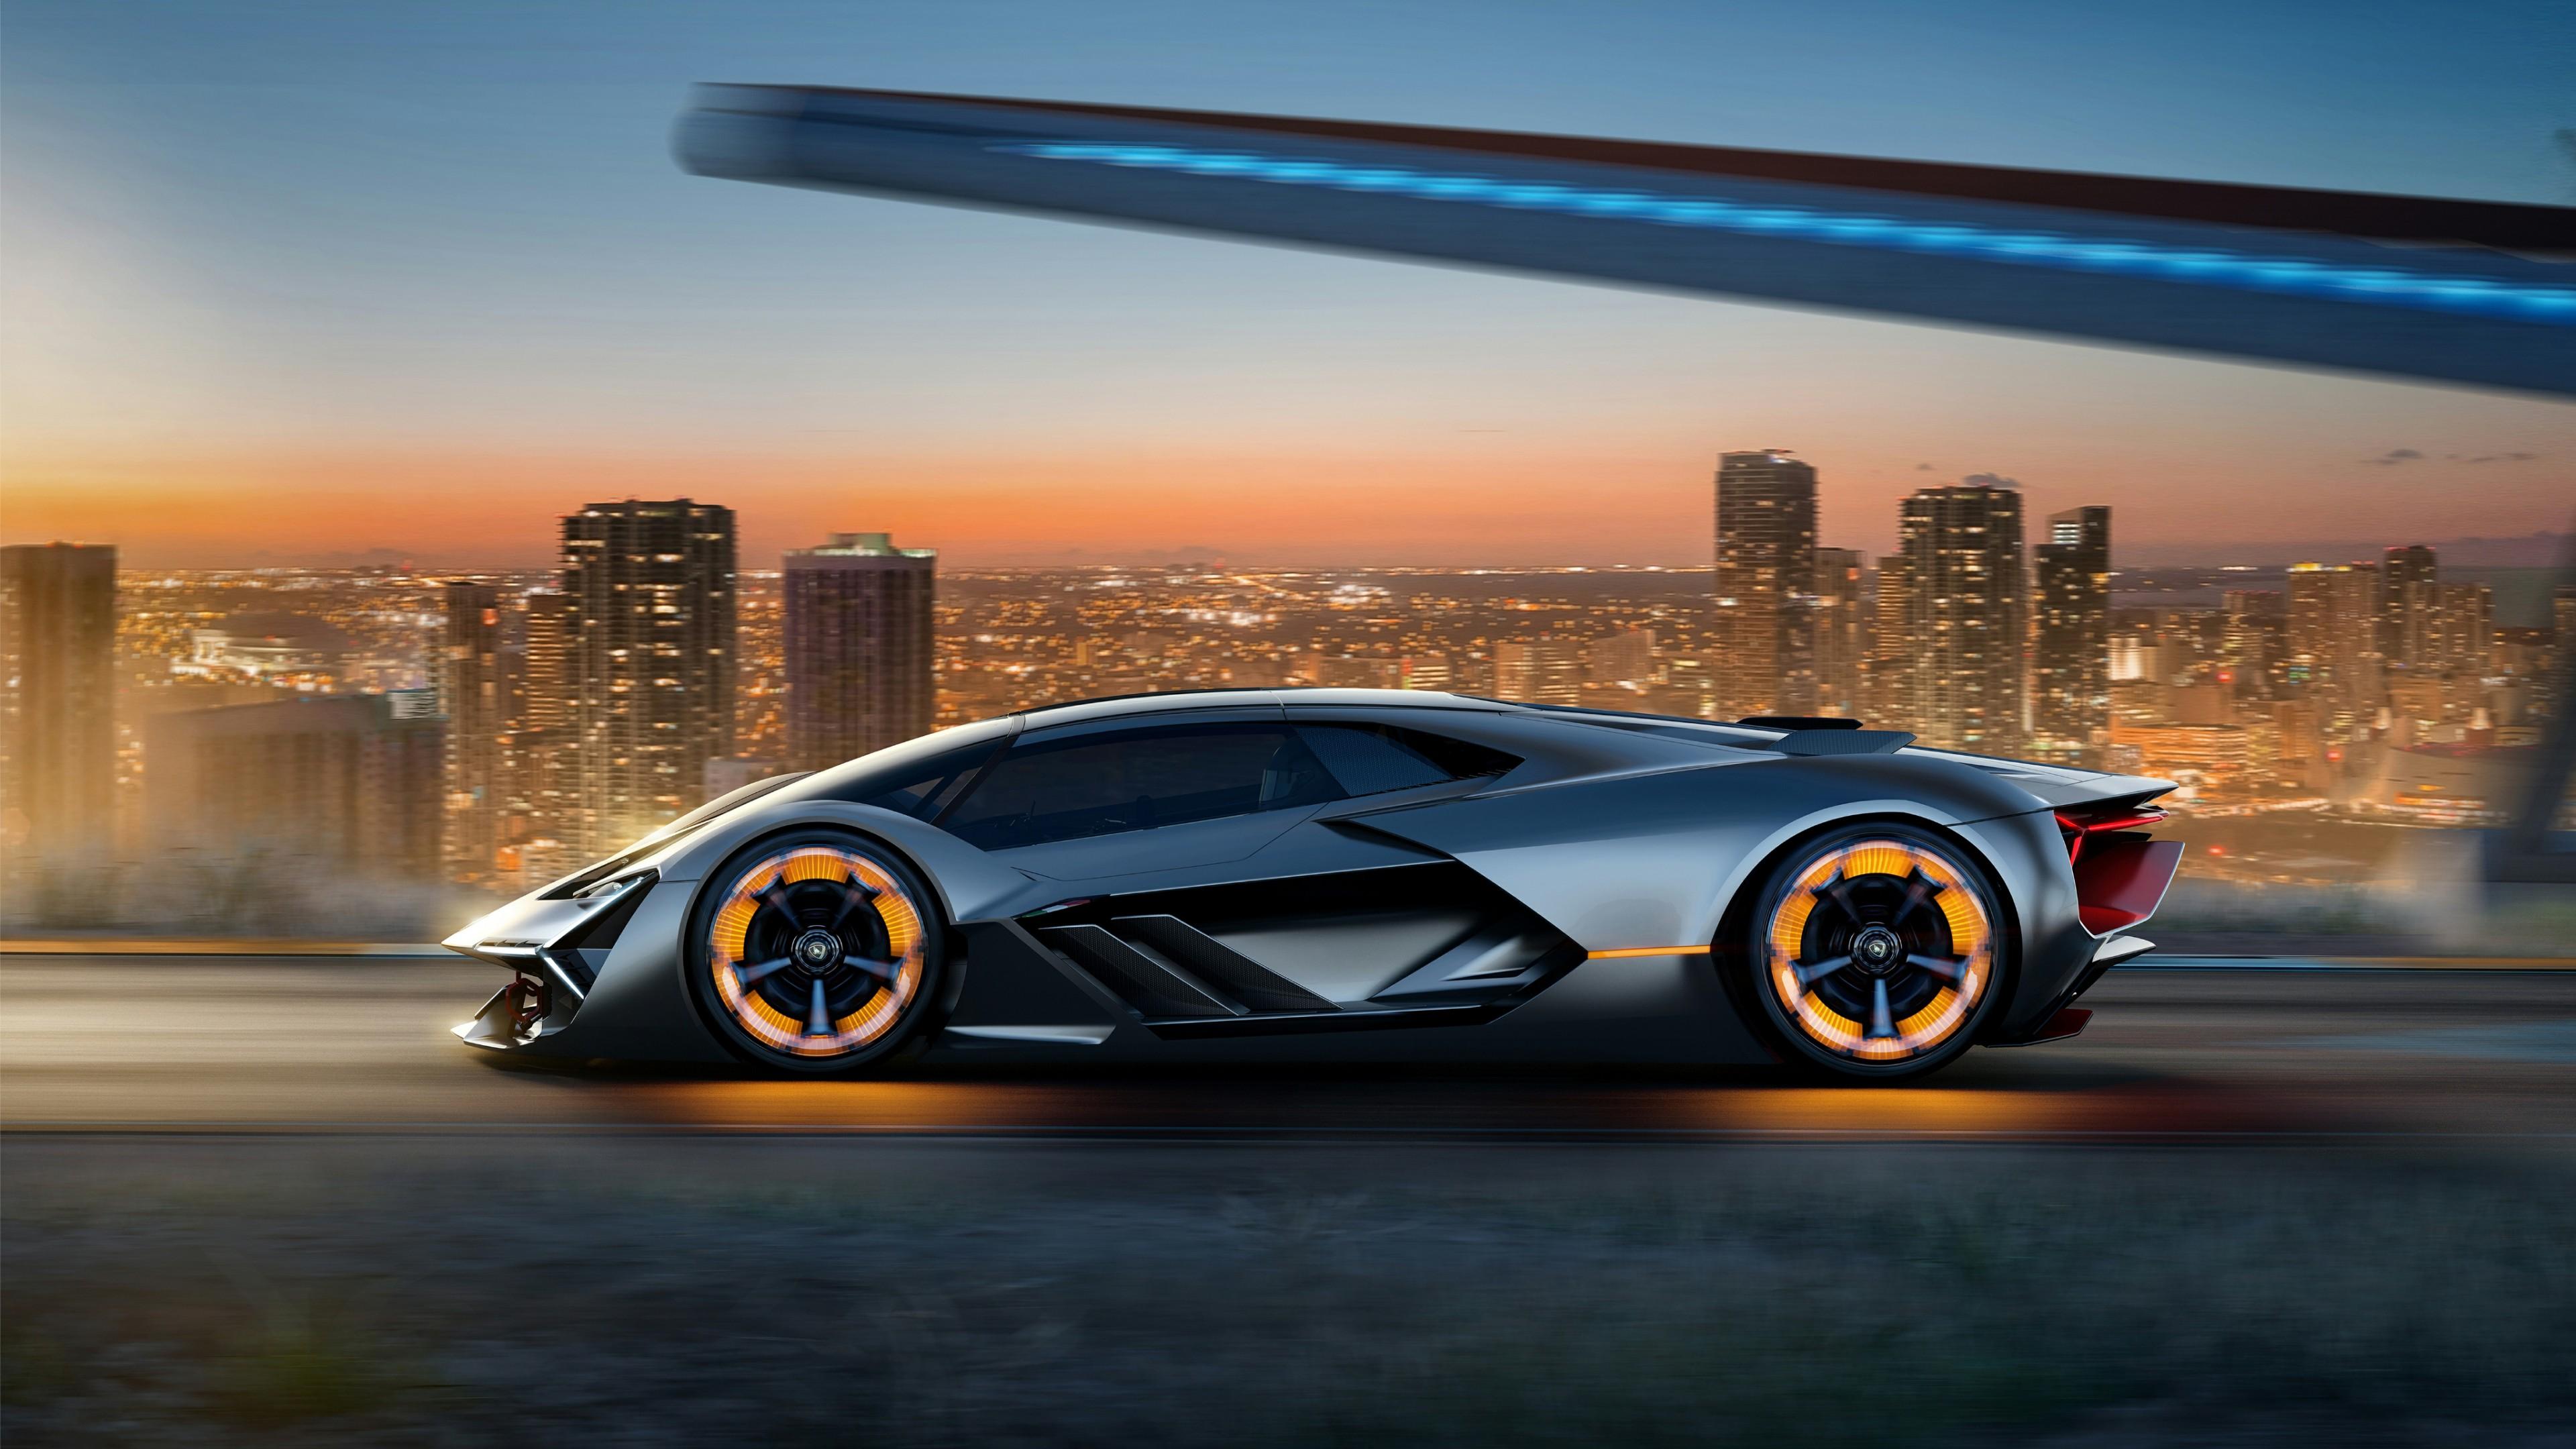 Lamborghini Terzo Millennio Ev Supercar 4k 3 Wallpaper Hd Car